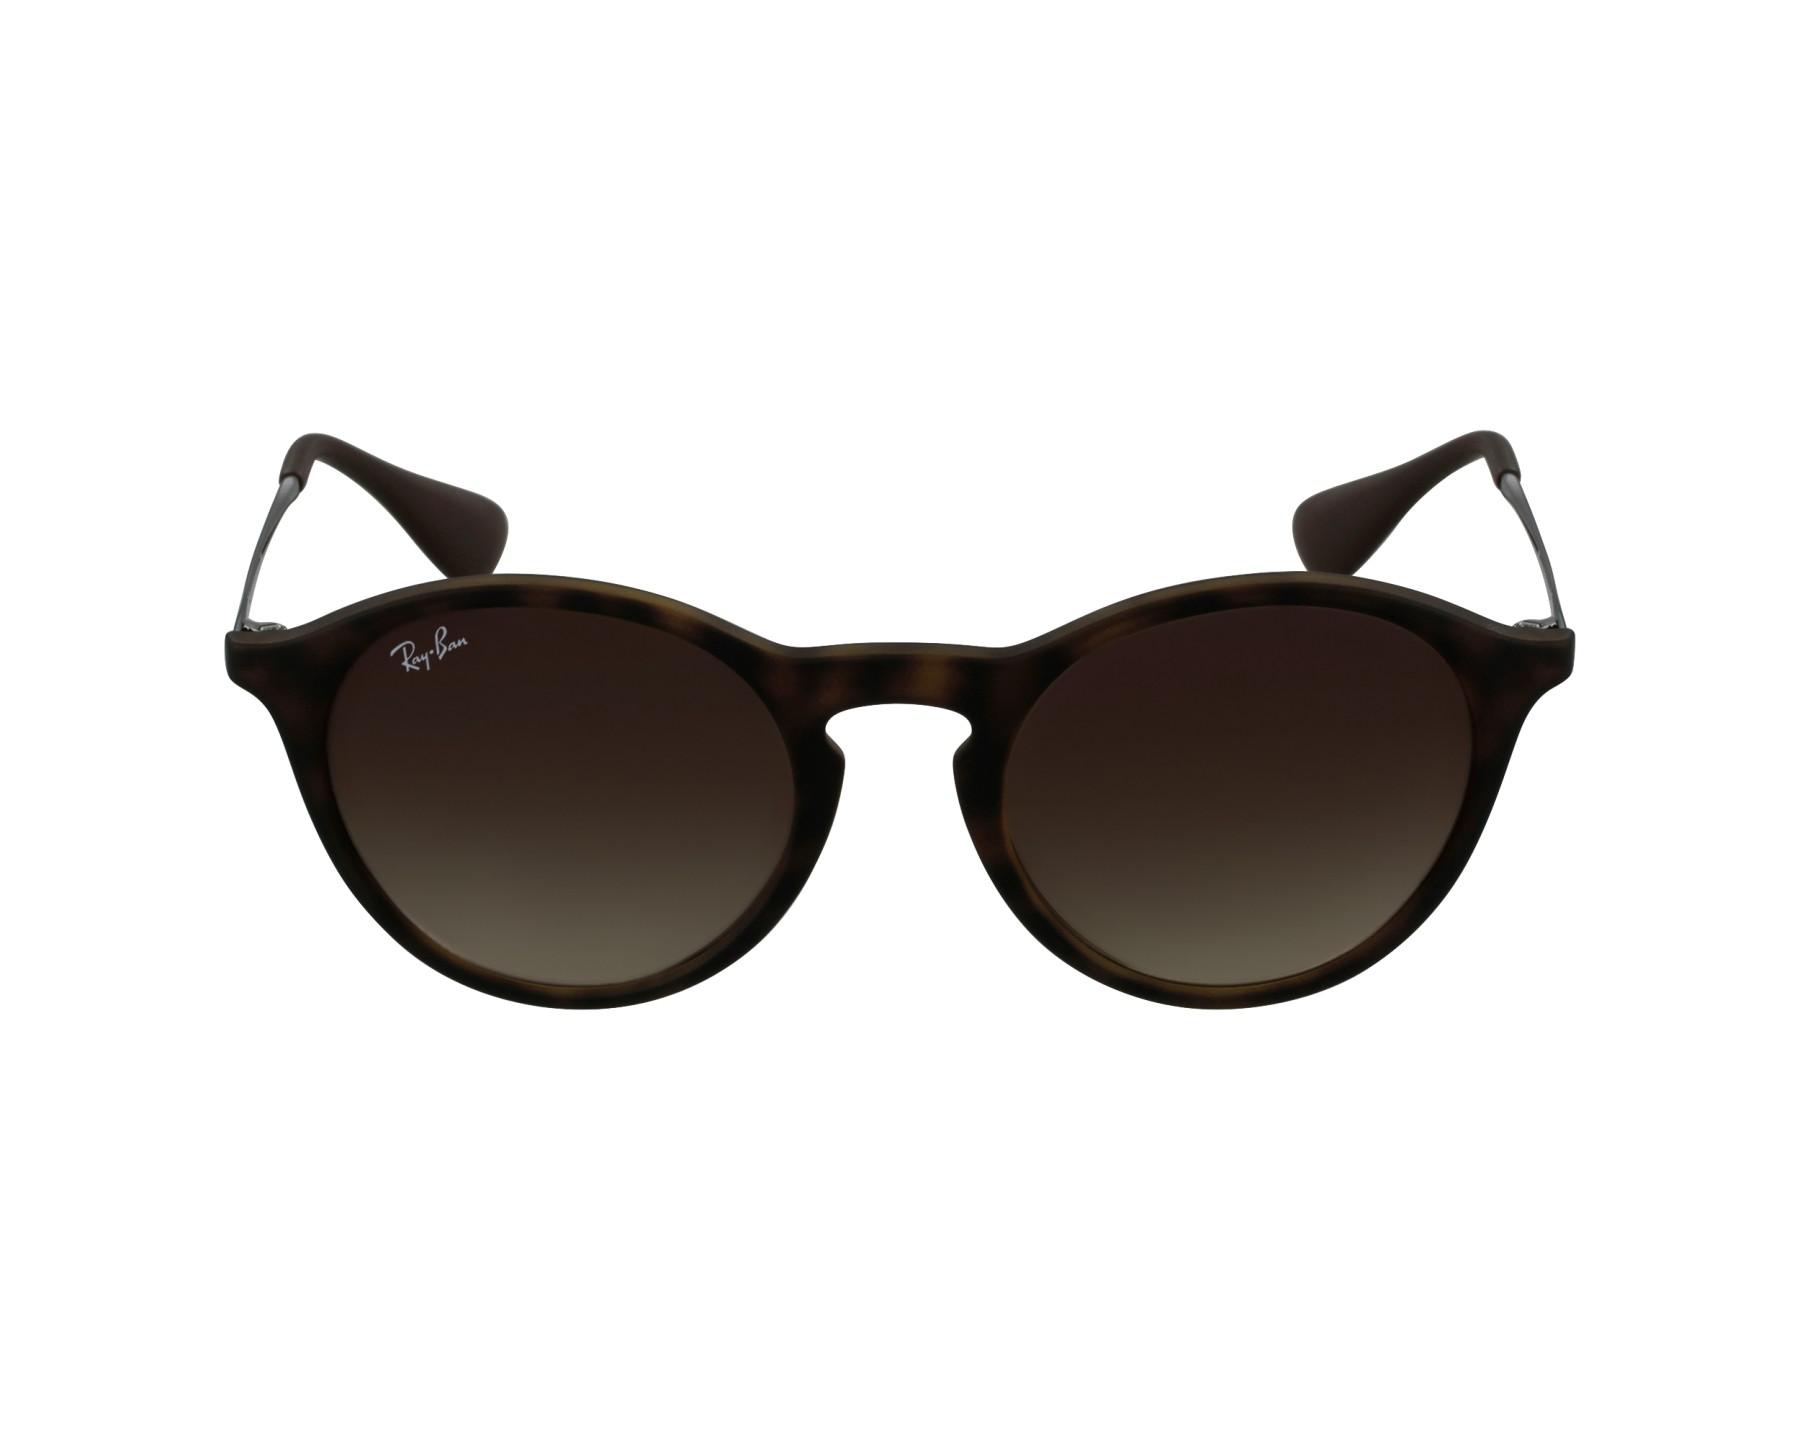 bdd2e08c607 thumbnail Sunglasses Ray-Ban RB-4243 865 13 - Havana Gun profile view